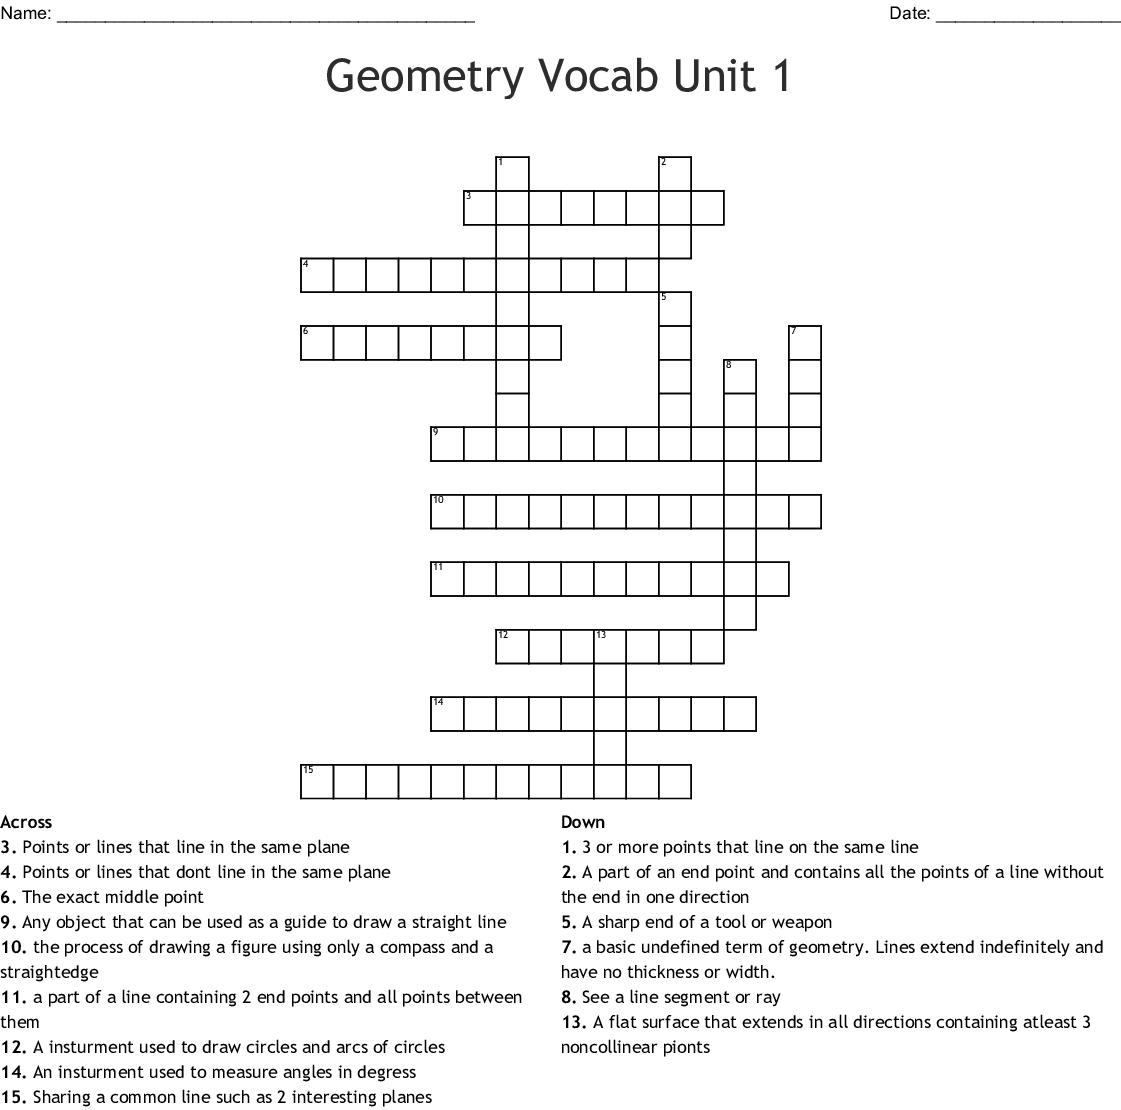 Geometry Vocab Unit 1 Crossword